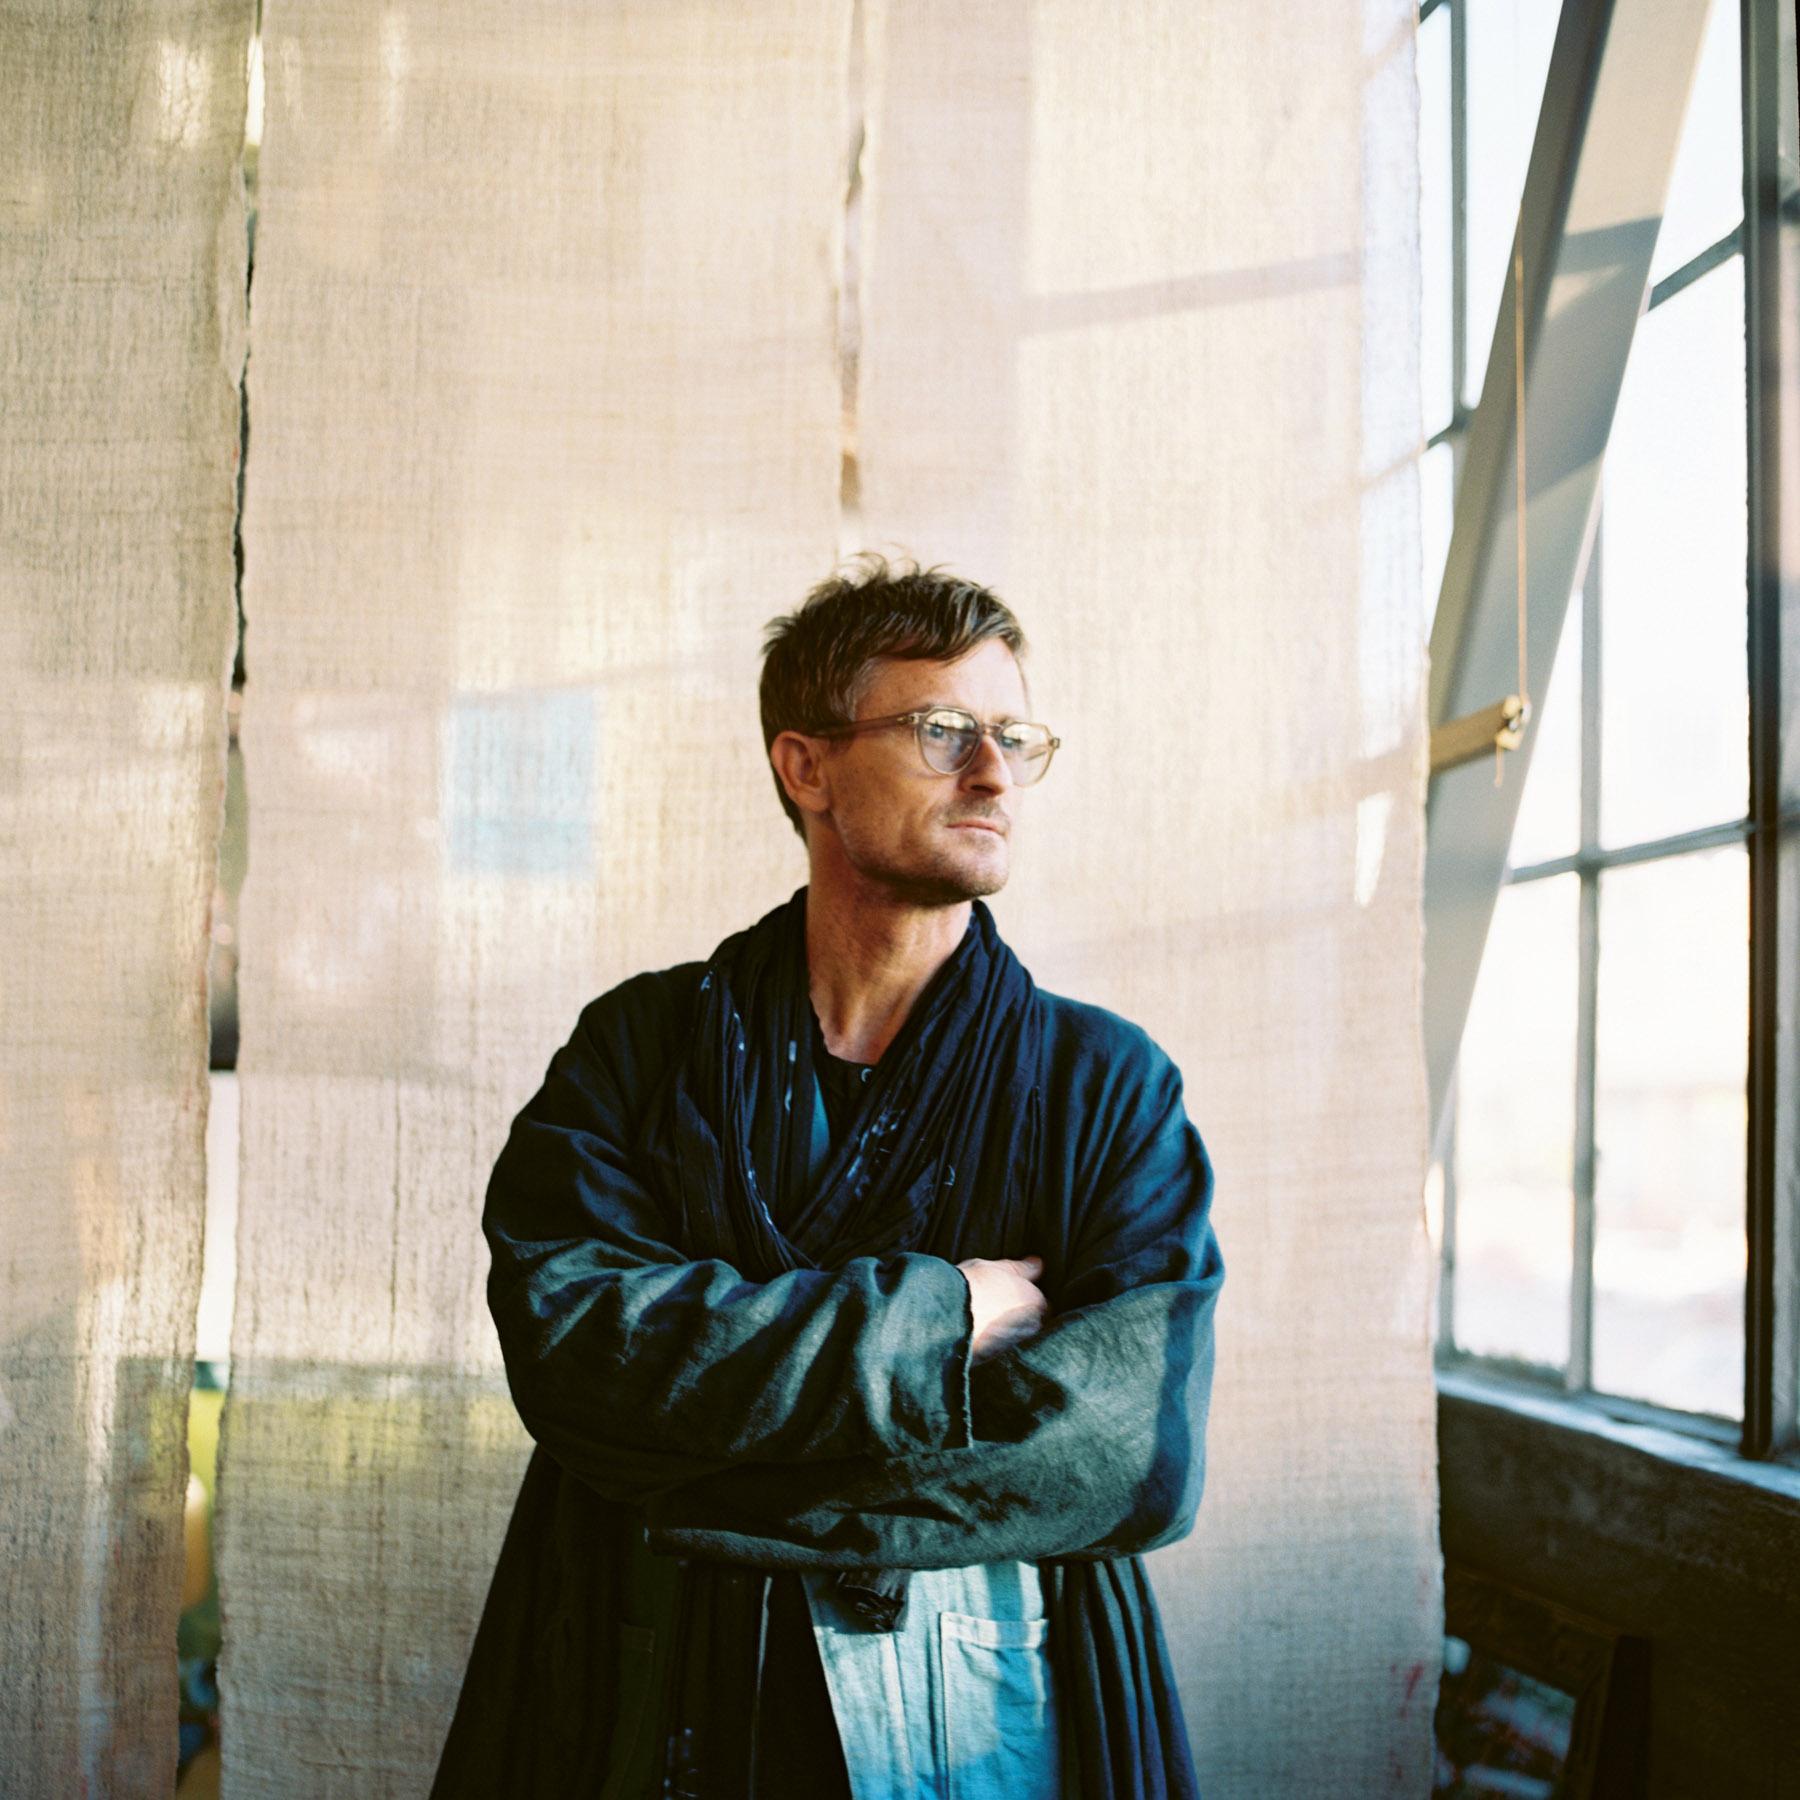 Matt Dick, Small Trade Co., Justin Chung, San Francisco, California